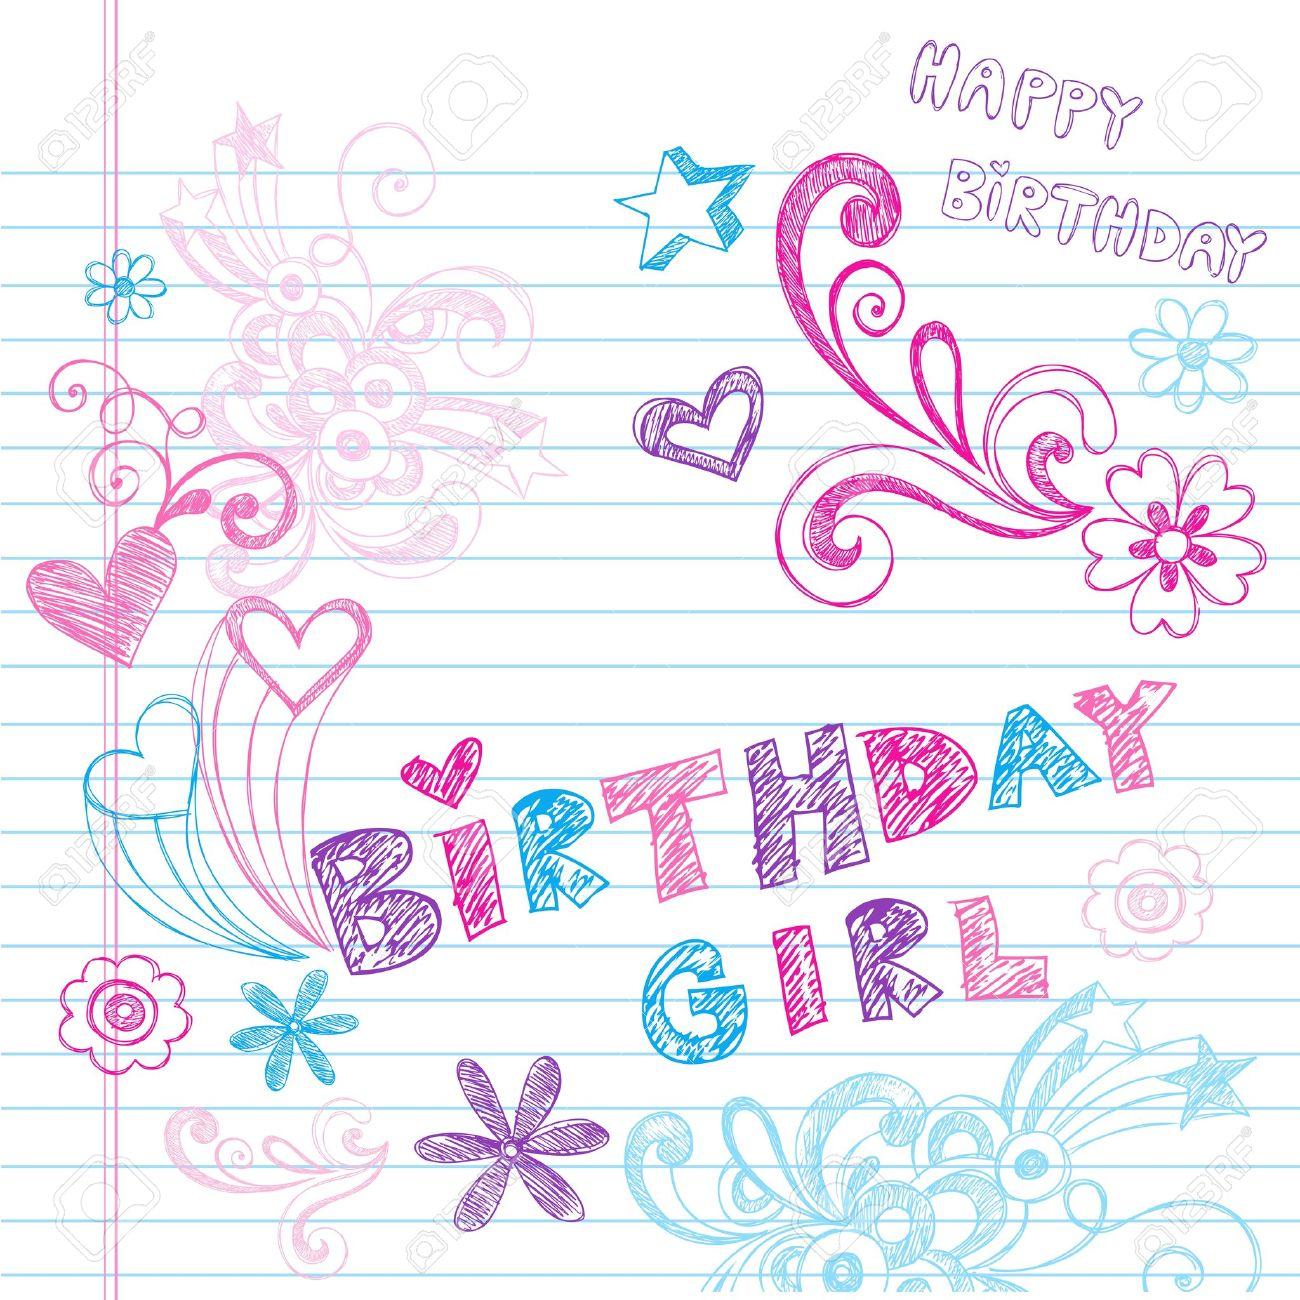 Happy Birthday Party Sketchy Back To School HandDrawn Notebook